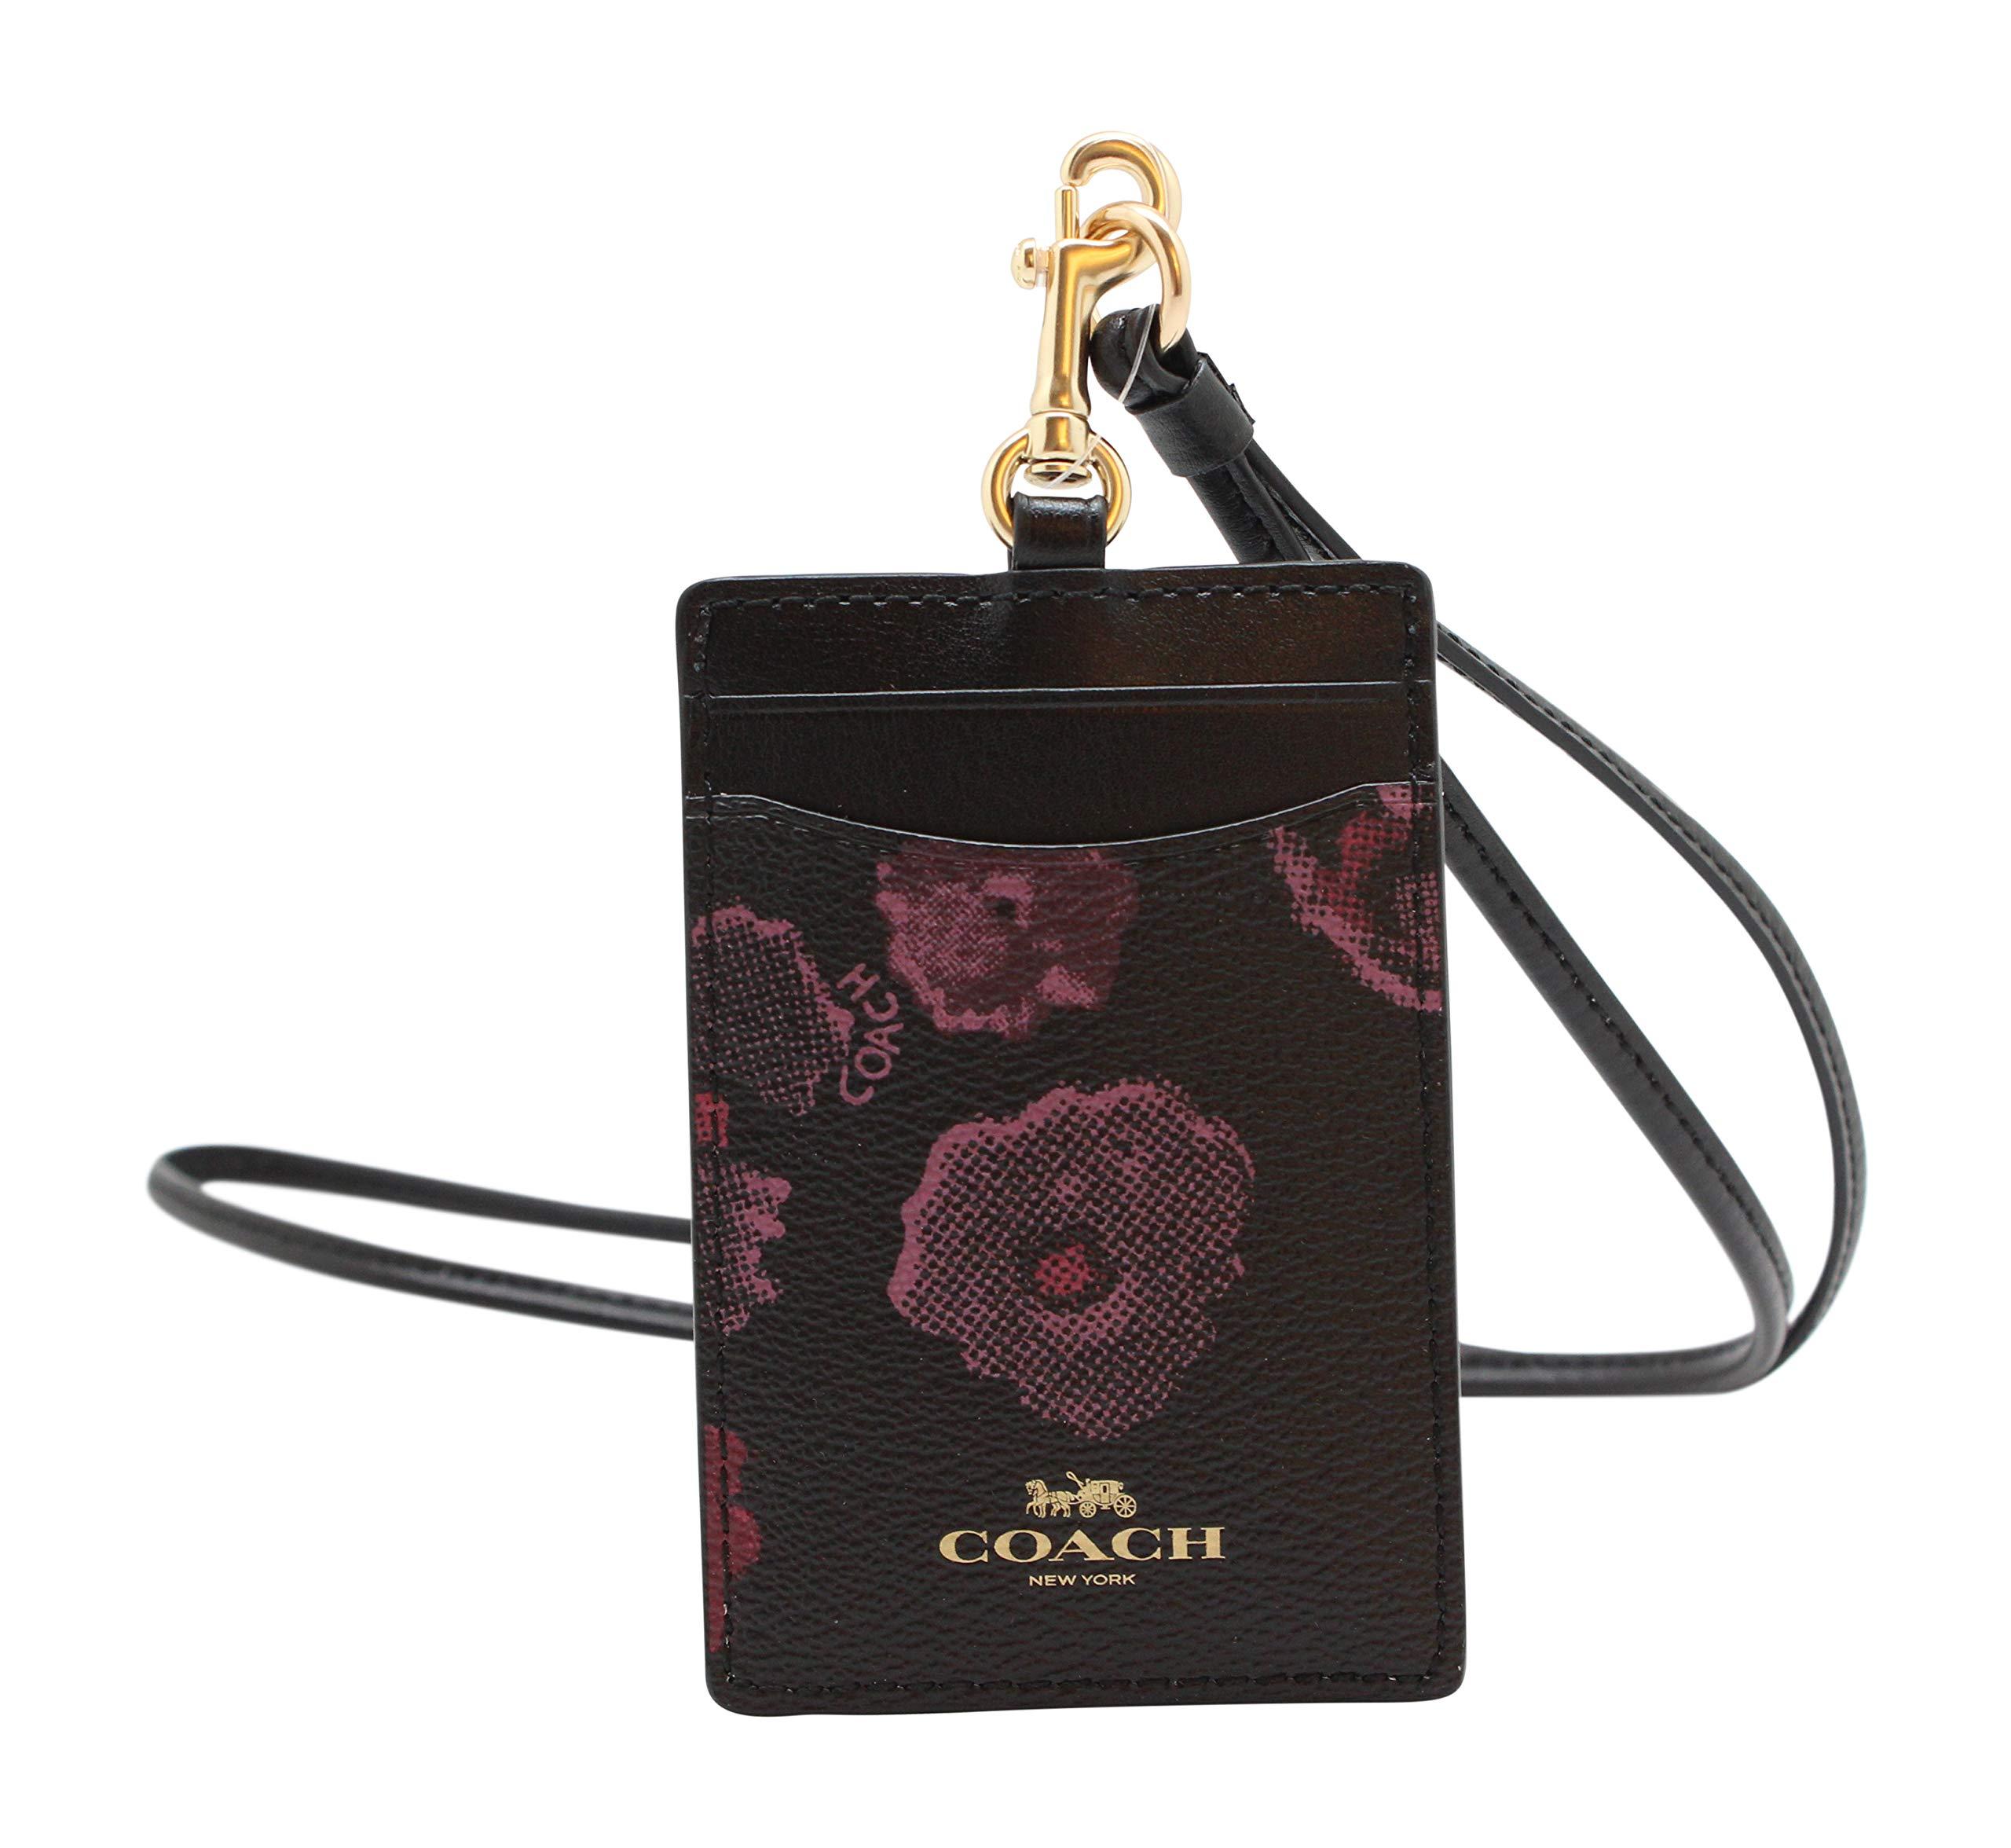 Coach F39055 Coated Canvas Badge ID Lanyard in Halftone Floral Print Black Wine